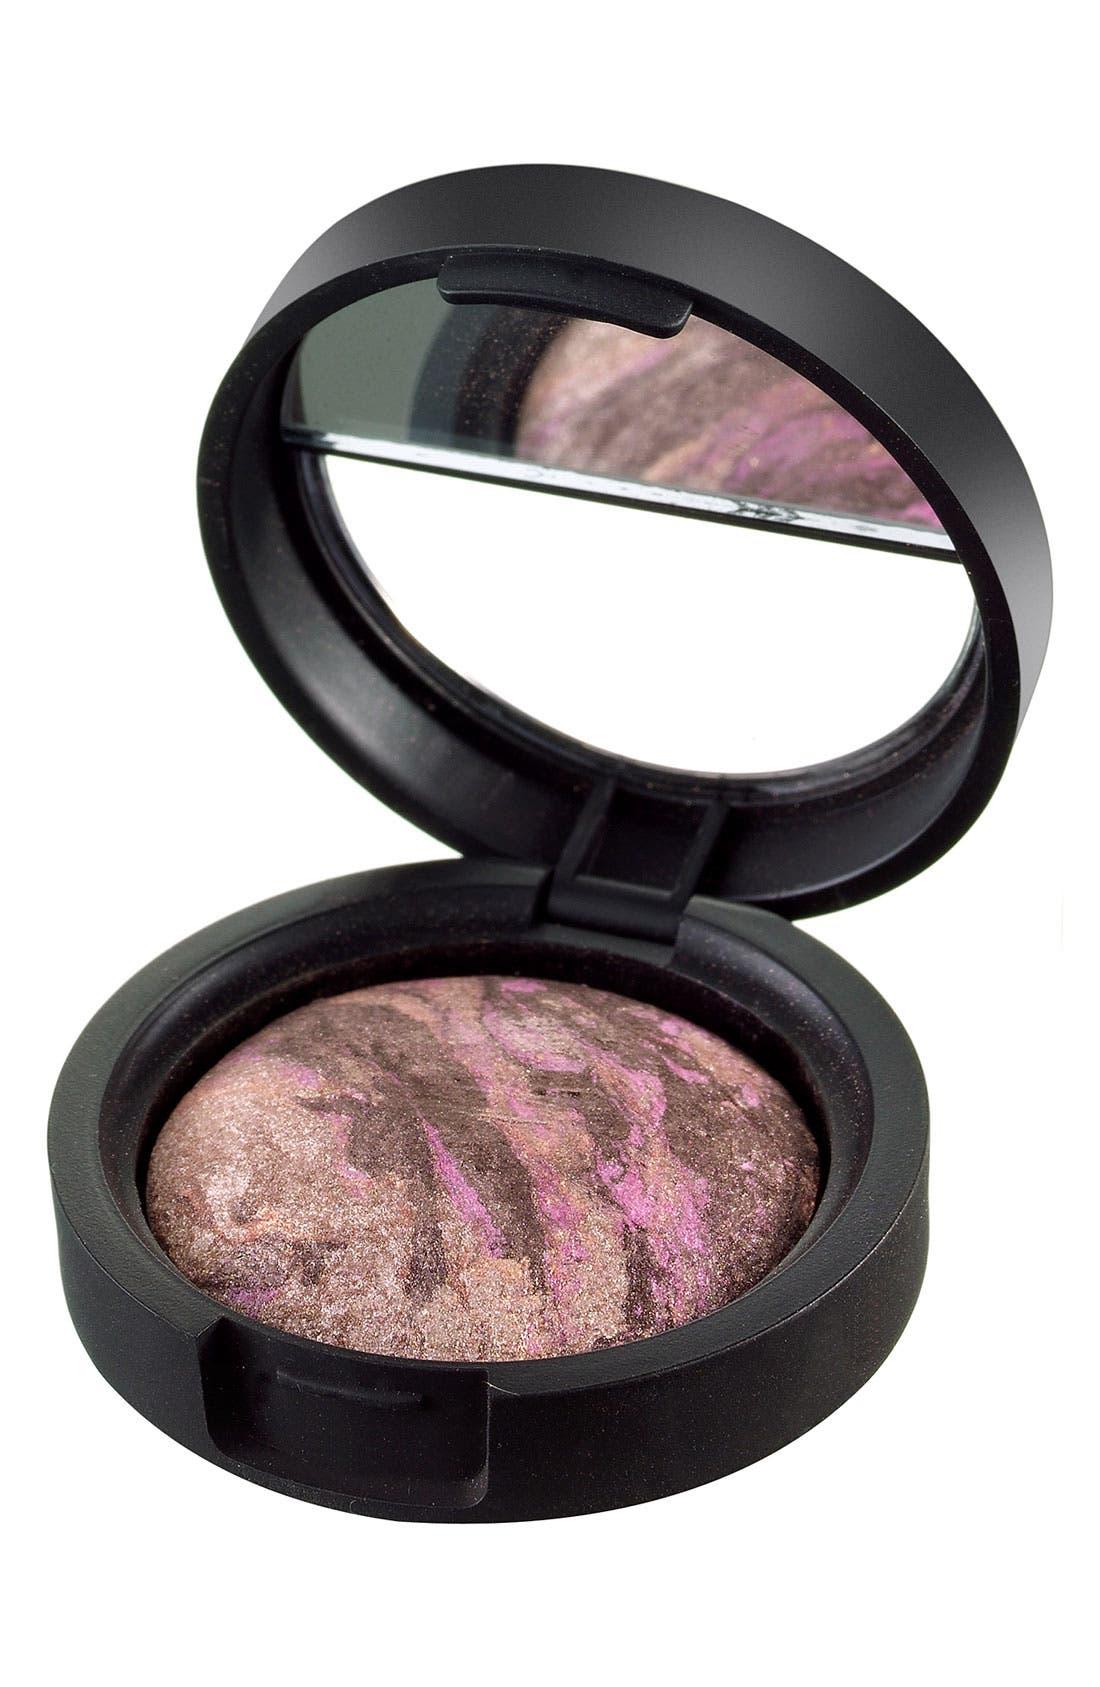 Laura Geller Beauty Baked Eyeshadow